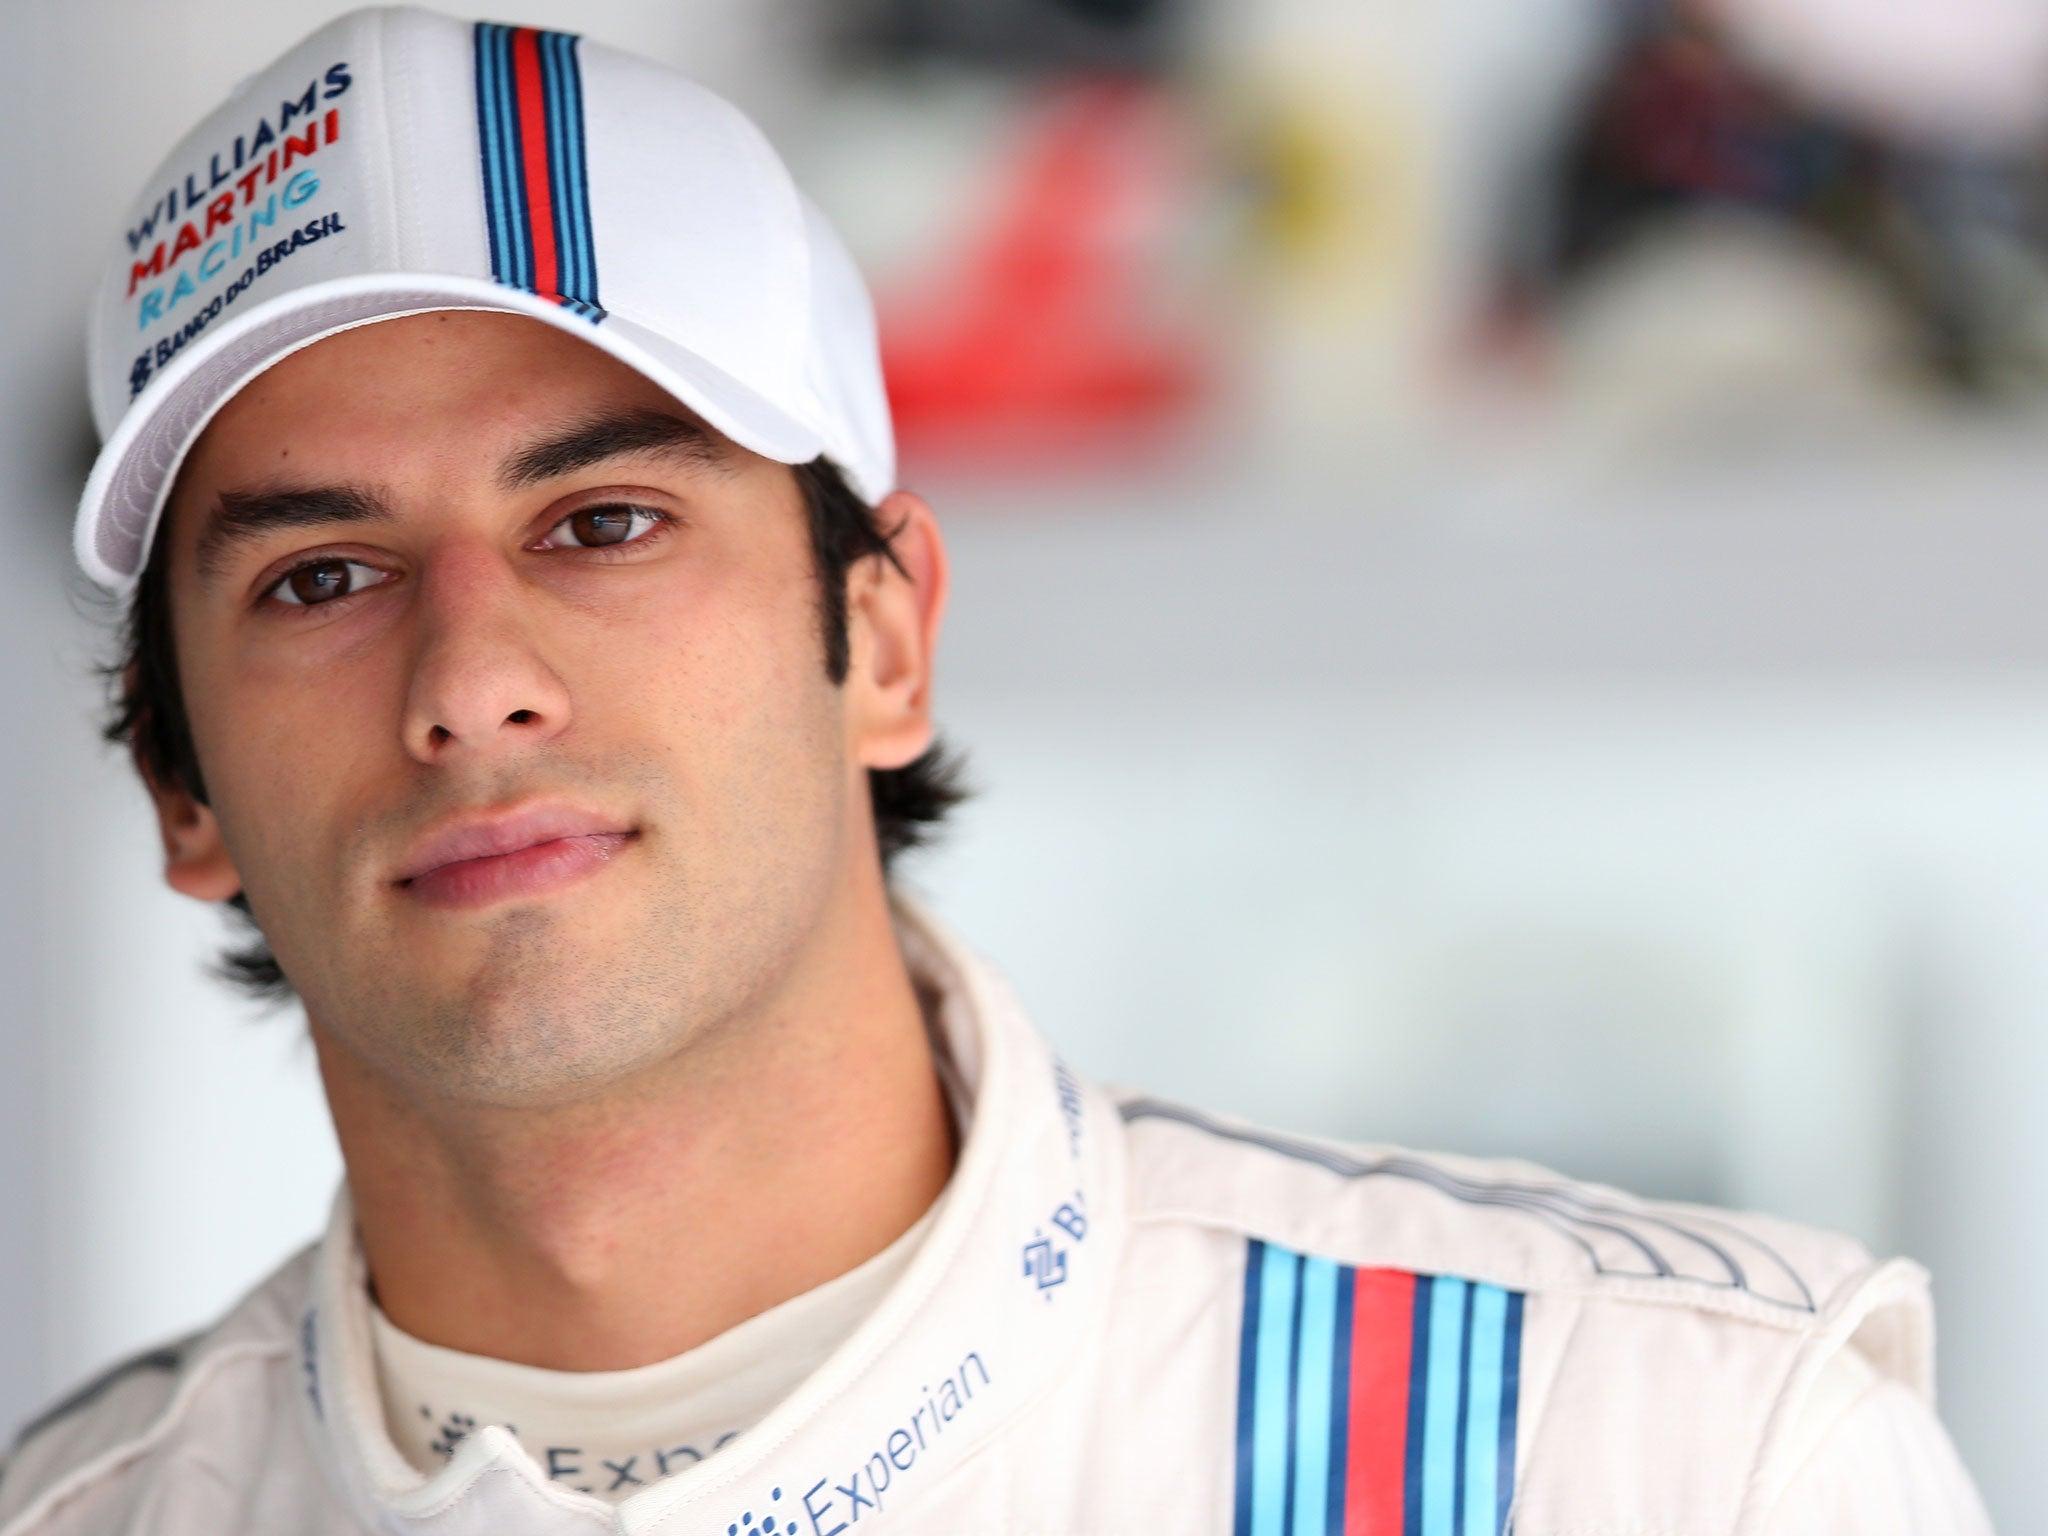 F1: Felipe Nasr joins Sauber to join Marcus Ericsson in ... Felipe Nasr